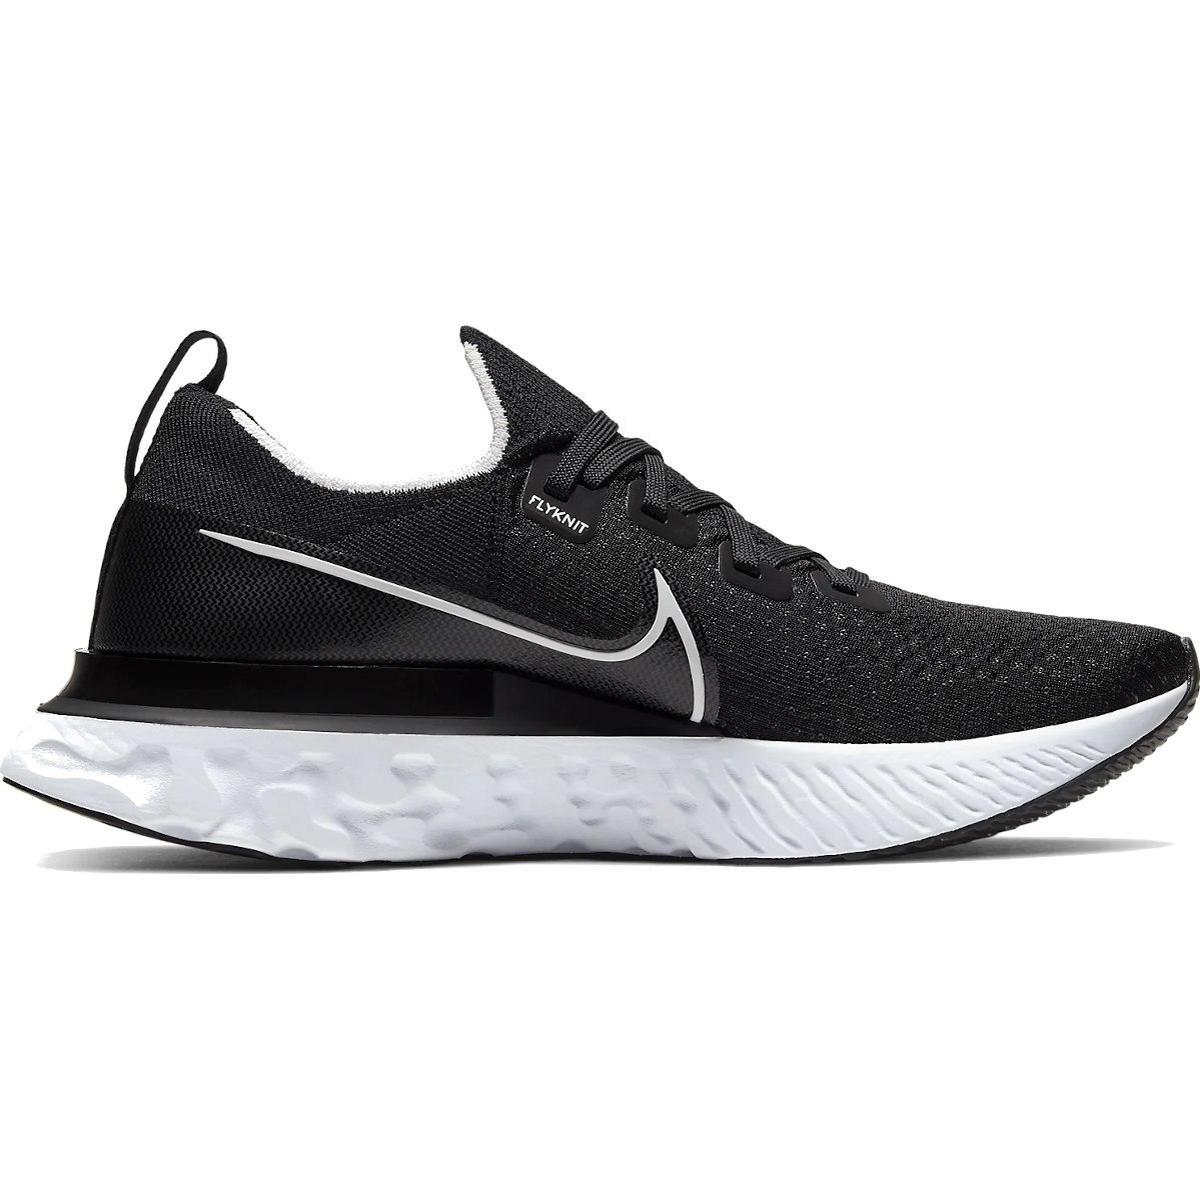 Nike React Sko (1000+ produkter) hos PriceRunner ???Se